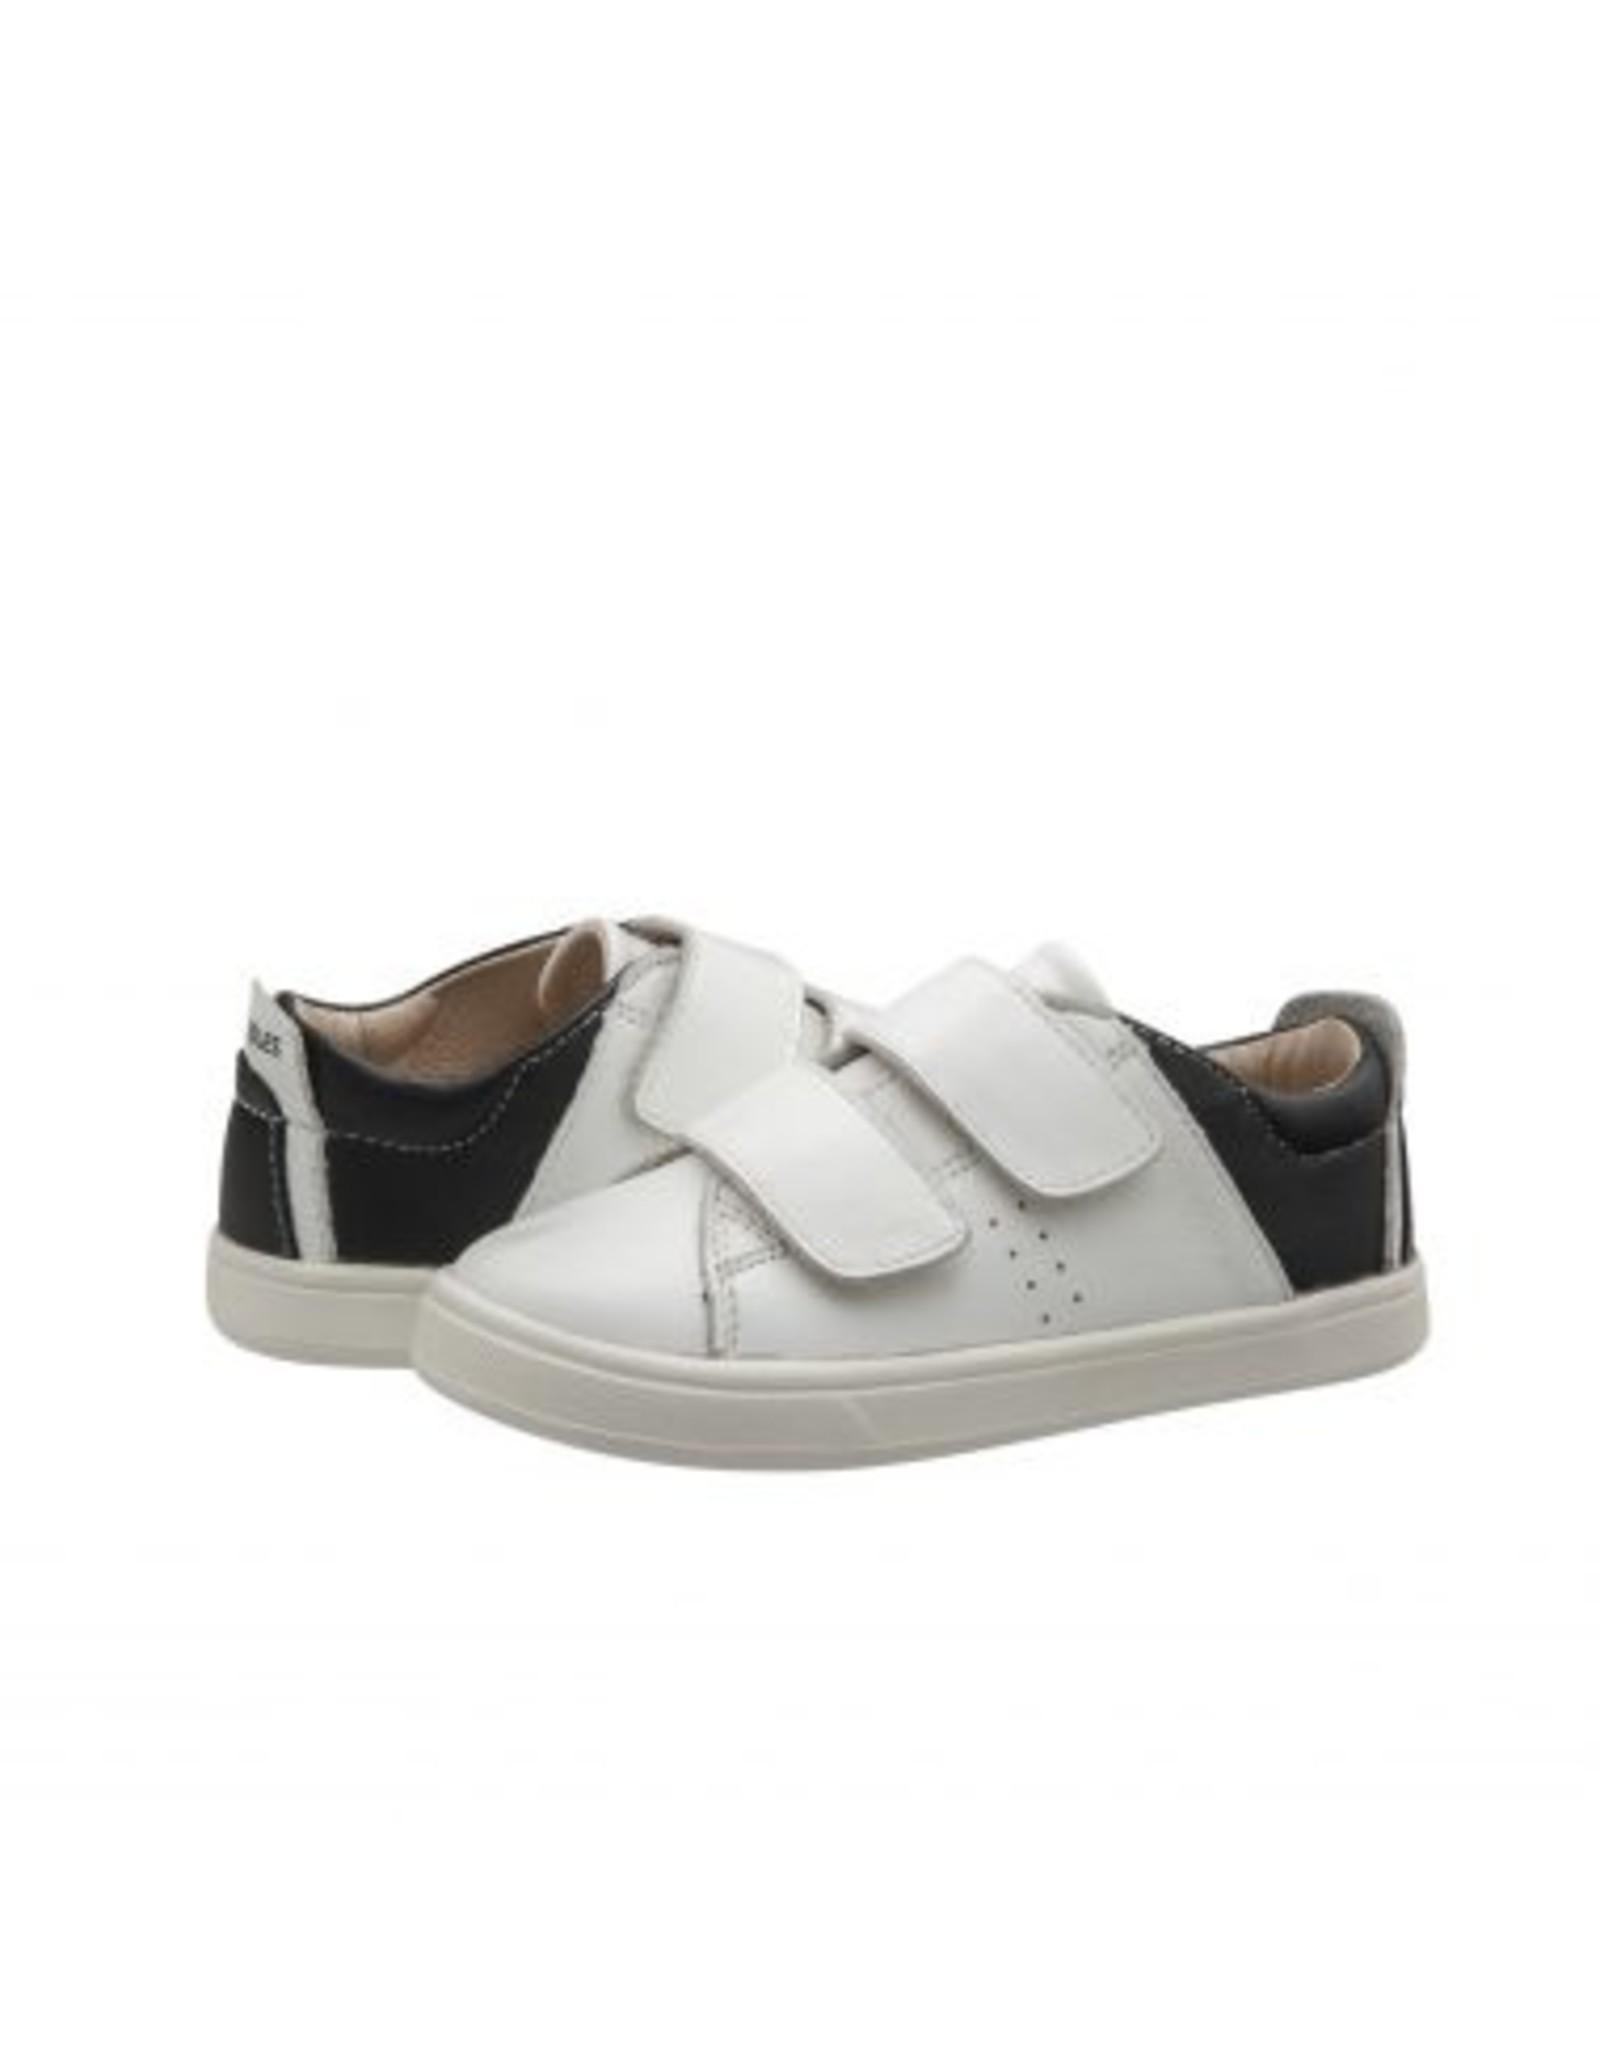 Oldsoles OLDSOLES Toko Shoe Snow/Black